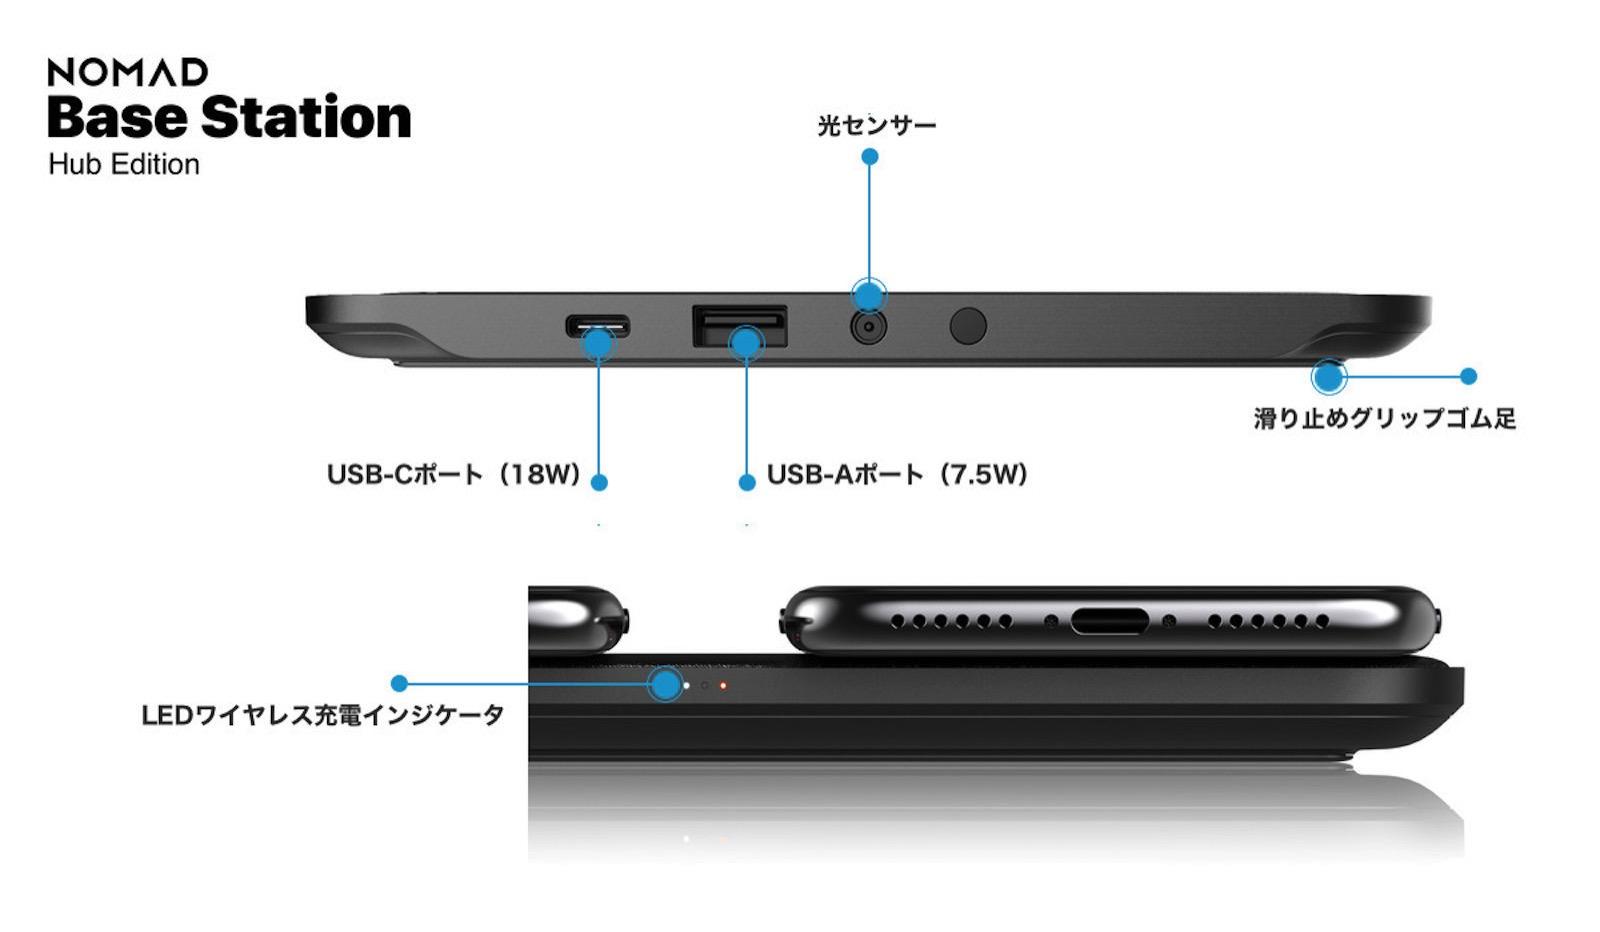 Nomad-Base-Station-Hub-Edition-1.jpg